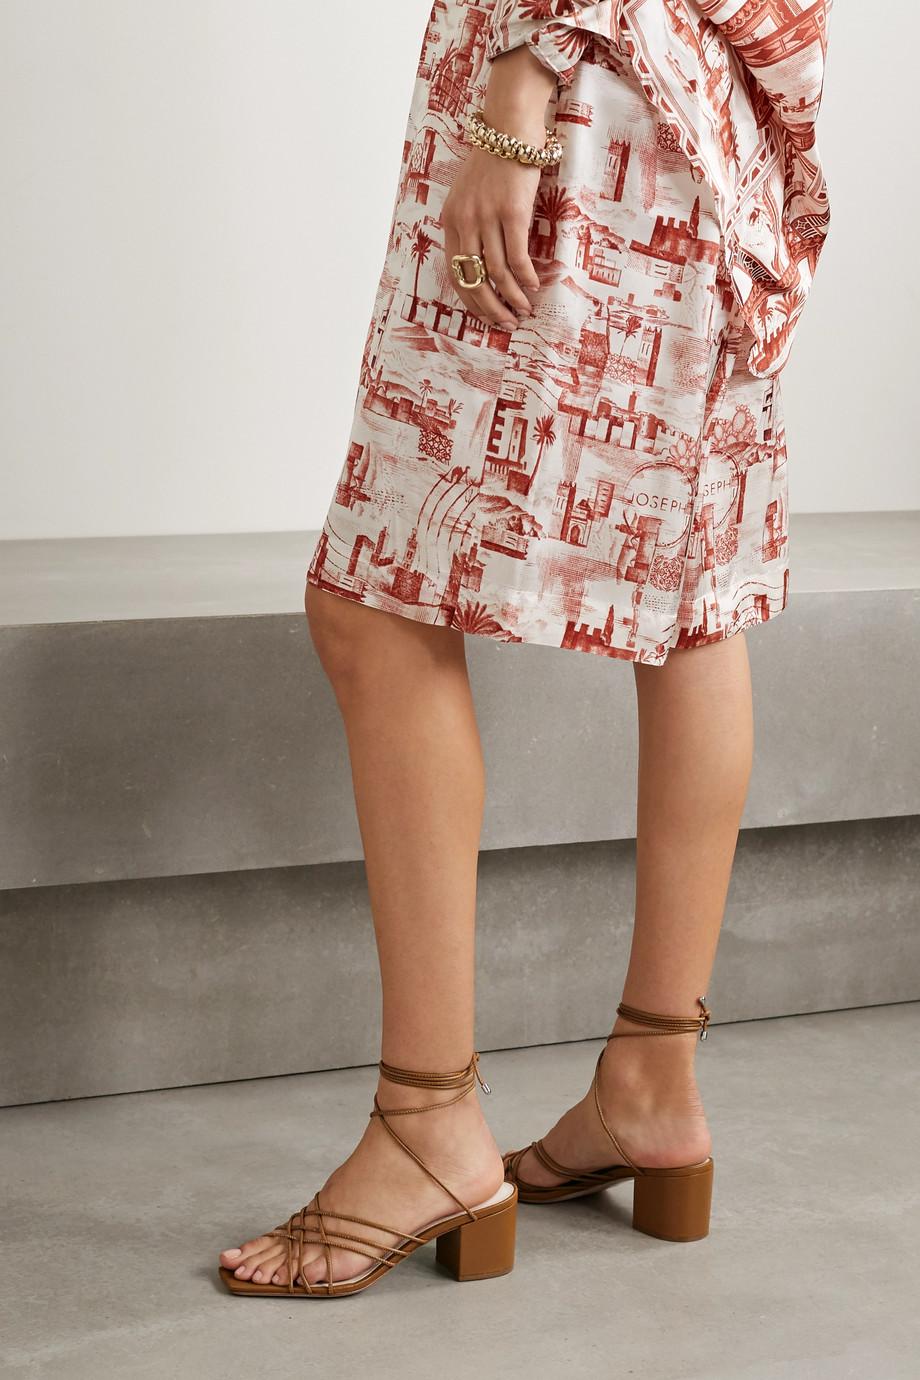 Porte & Paire Sandalen aus geflochtenem Leder